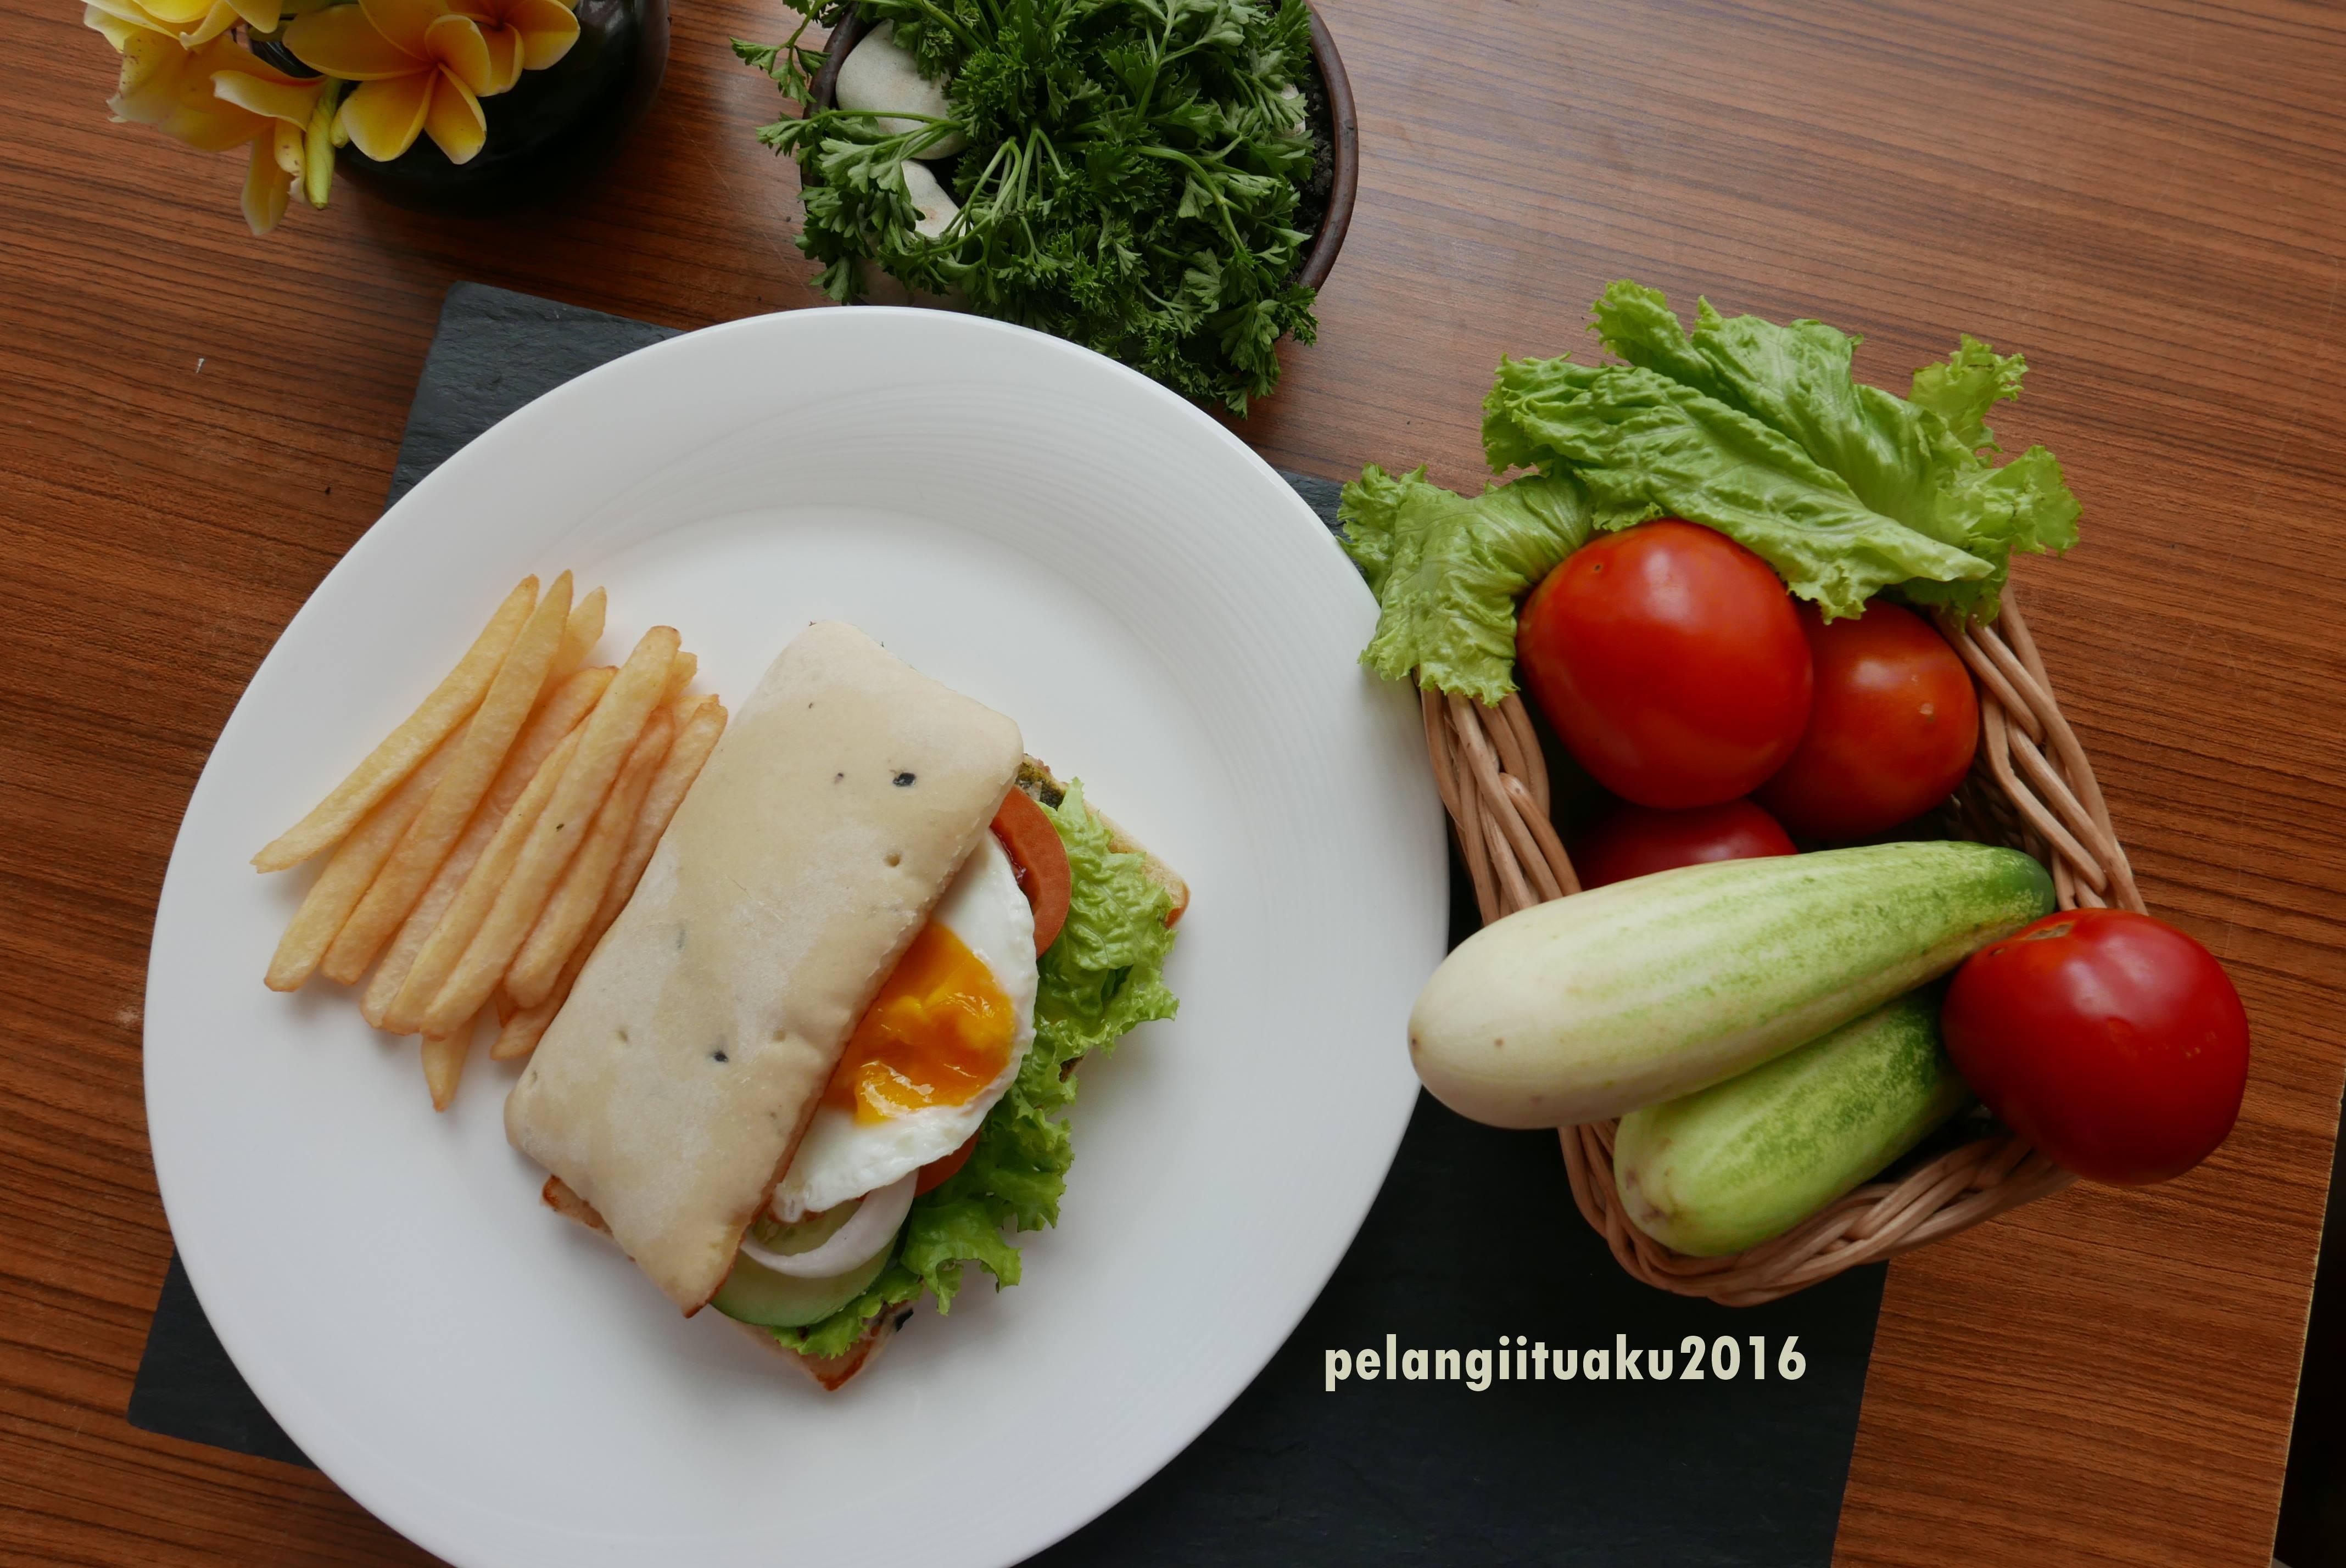 Lihatlah Pelangi Itu Aku Jalan Jalan Makan Makan Review Puisi